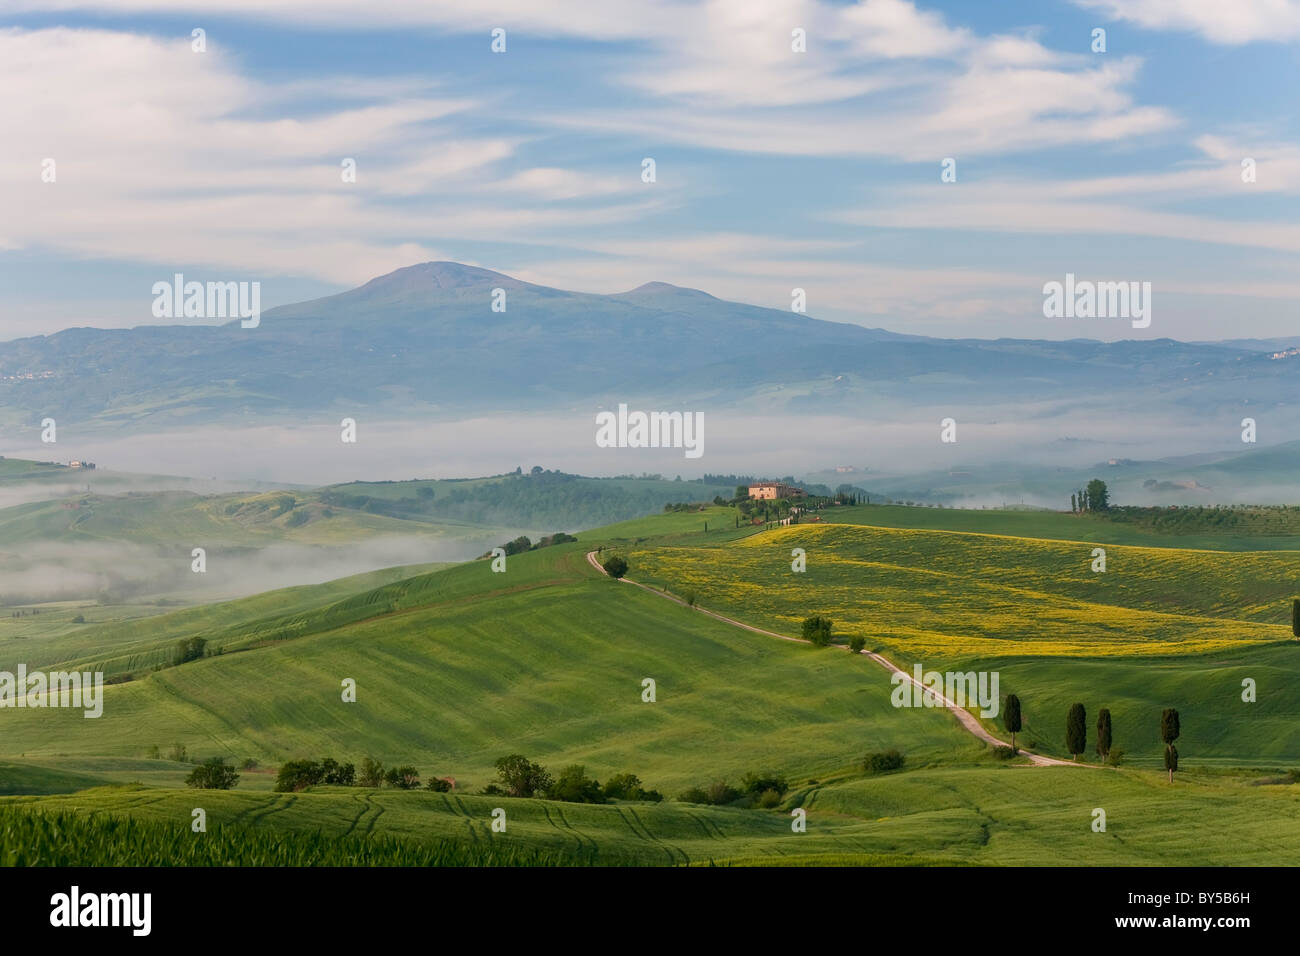 Vía, San Quirico d'Orcia, Val d'Orcia, Toscana, Italia Foto de stock